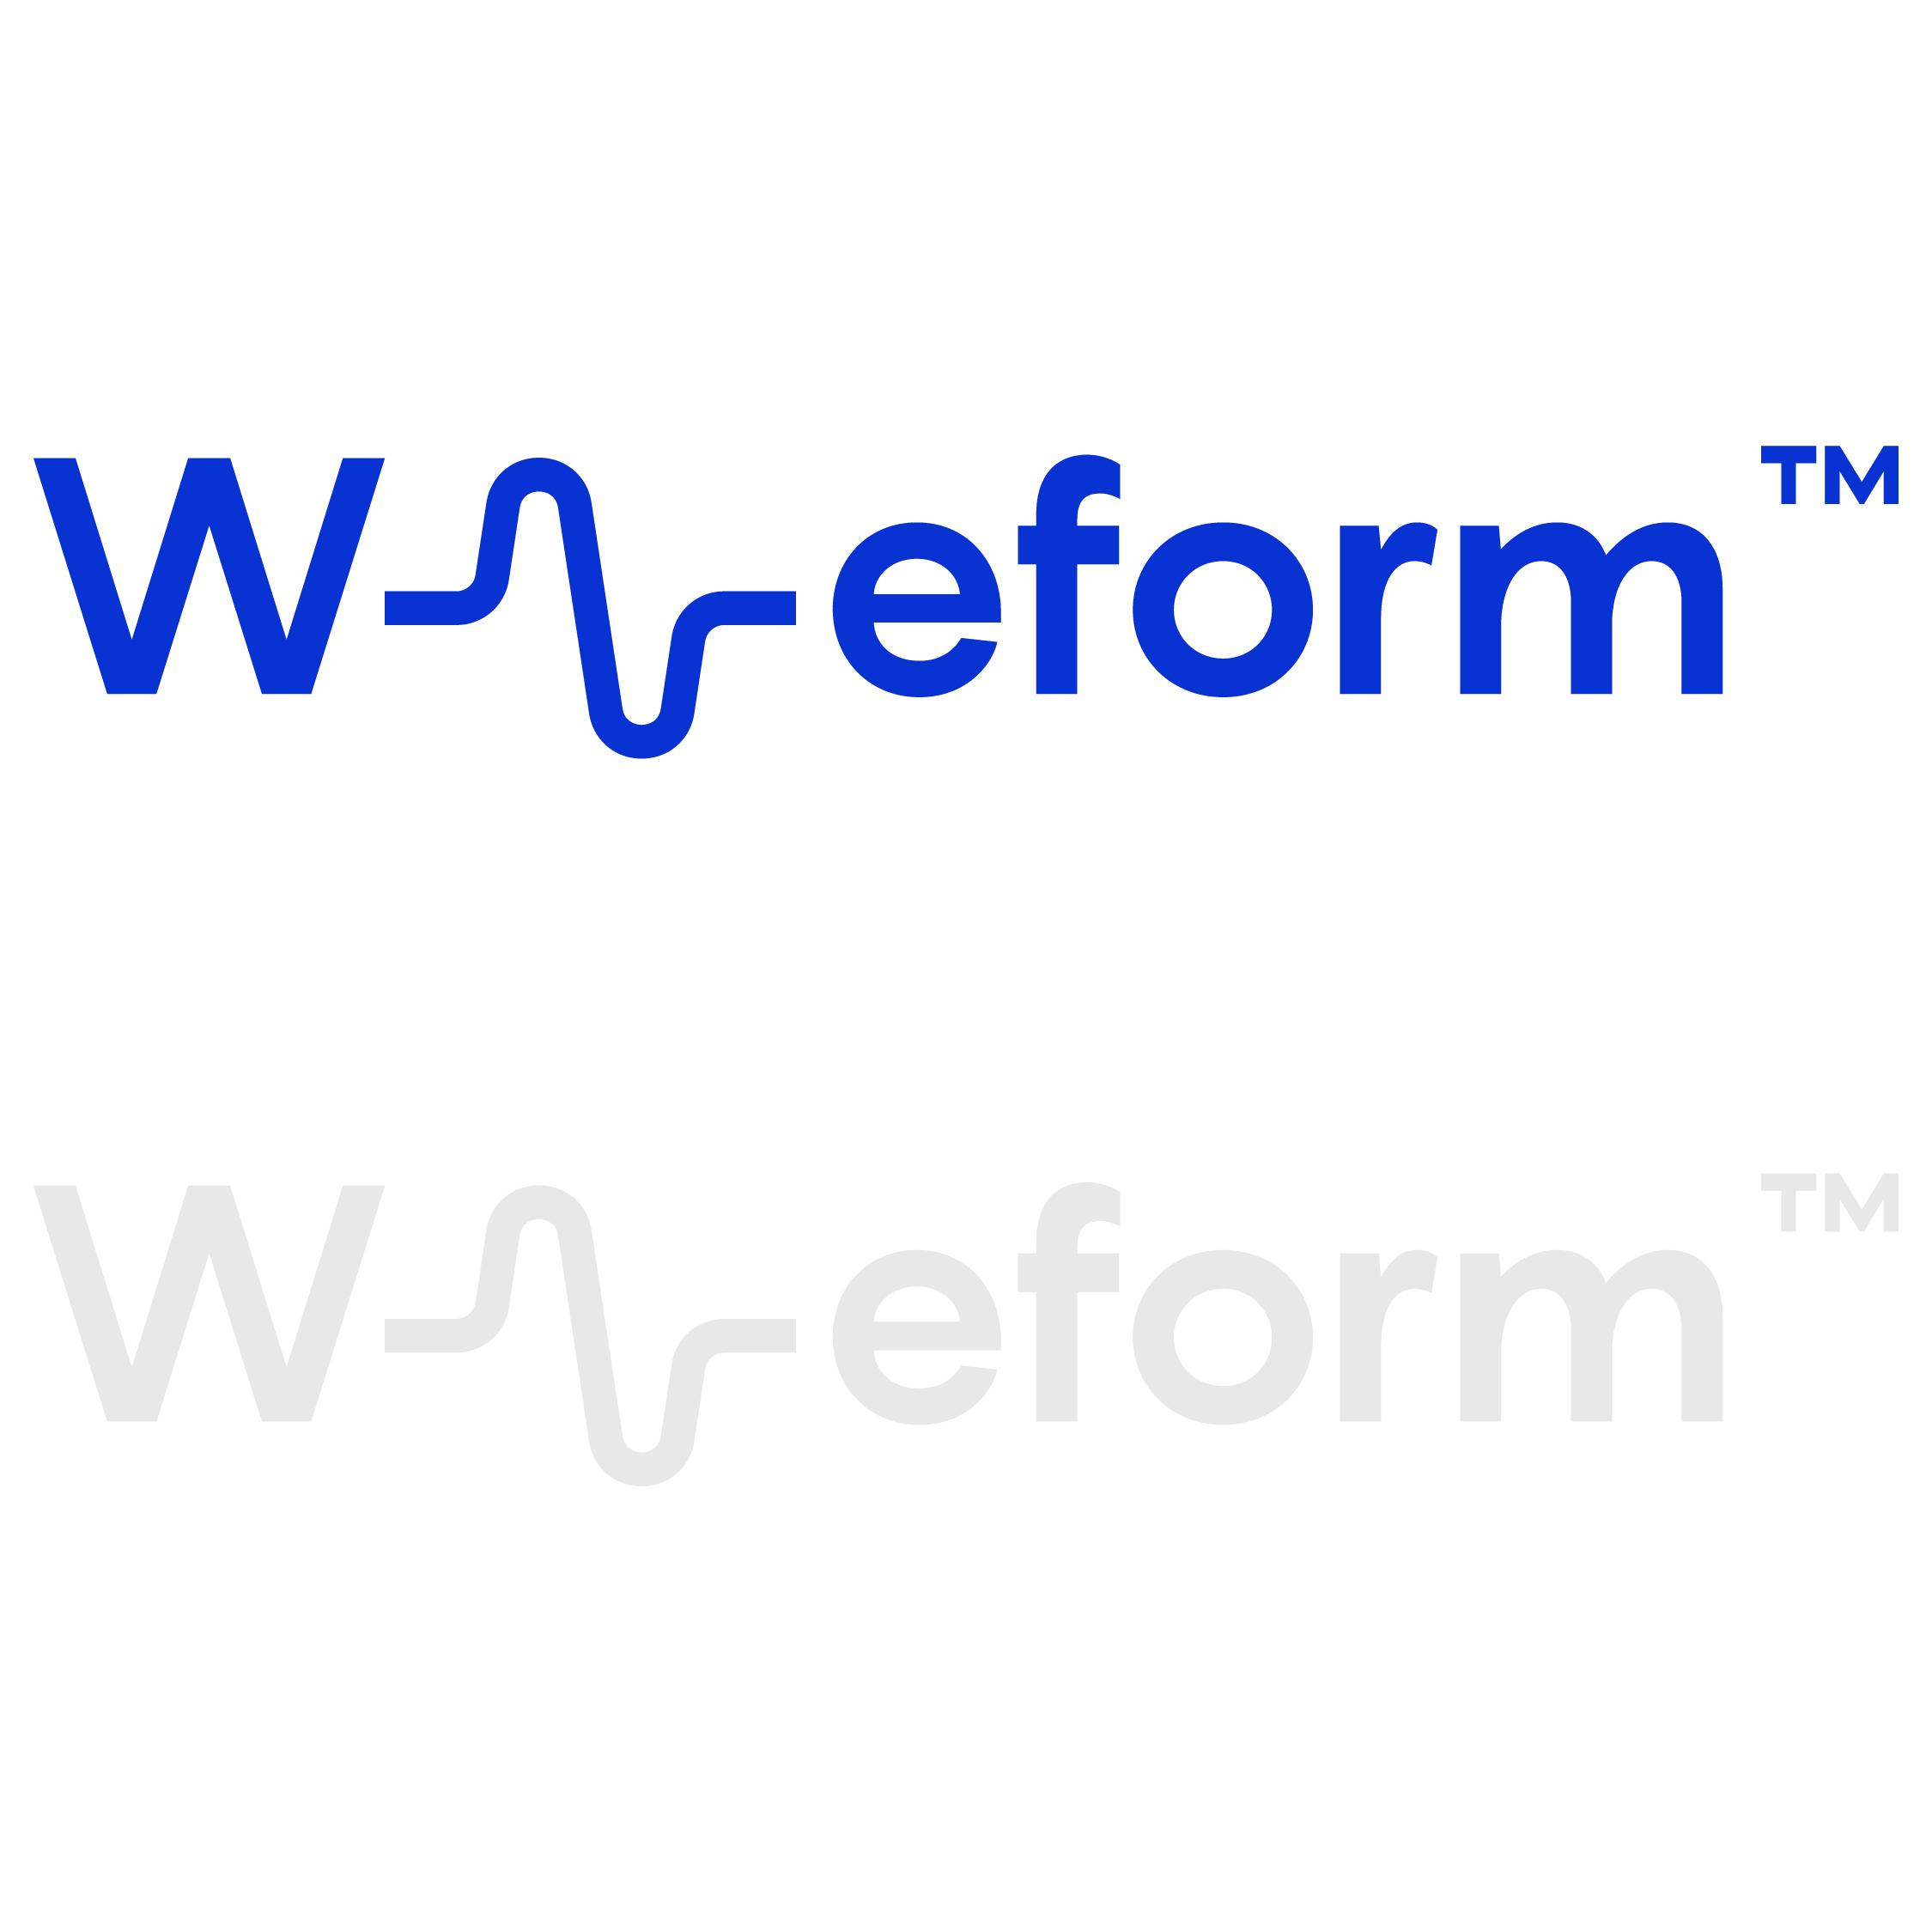 ss waveform-01.jpg